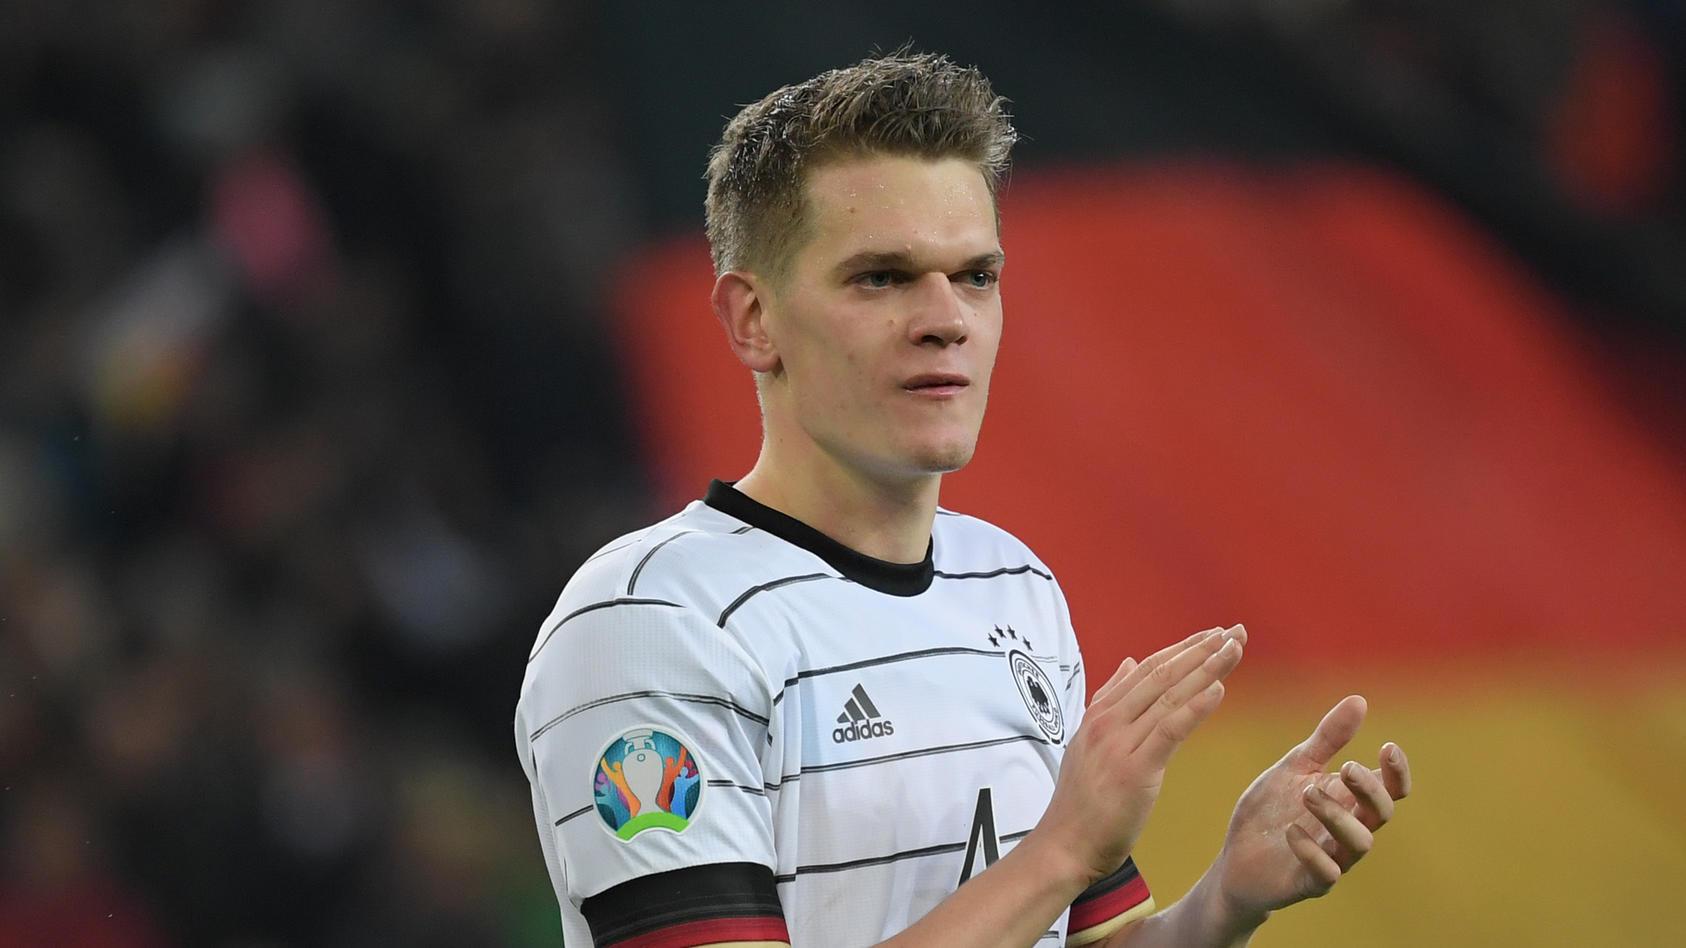 Matthias Ginter im Trikot der Fußball-Nationalmannschaft